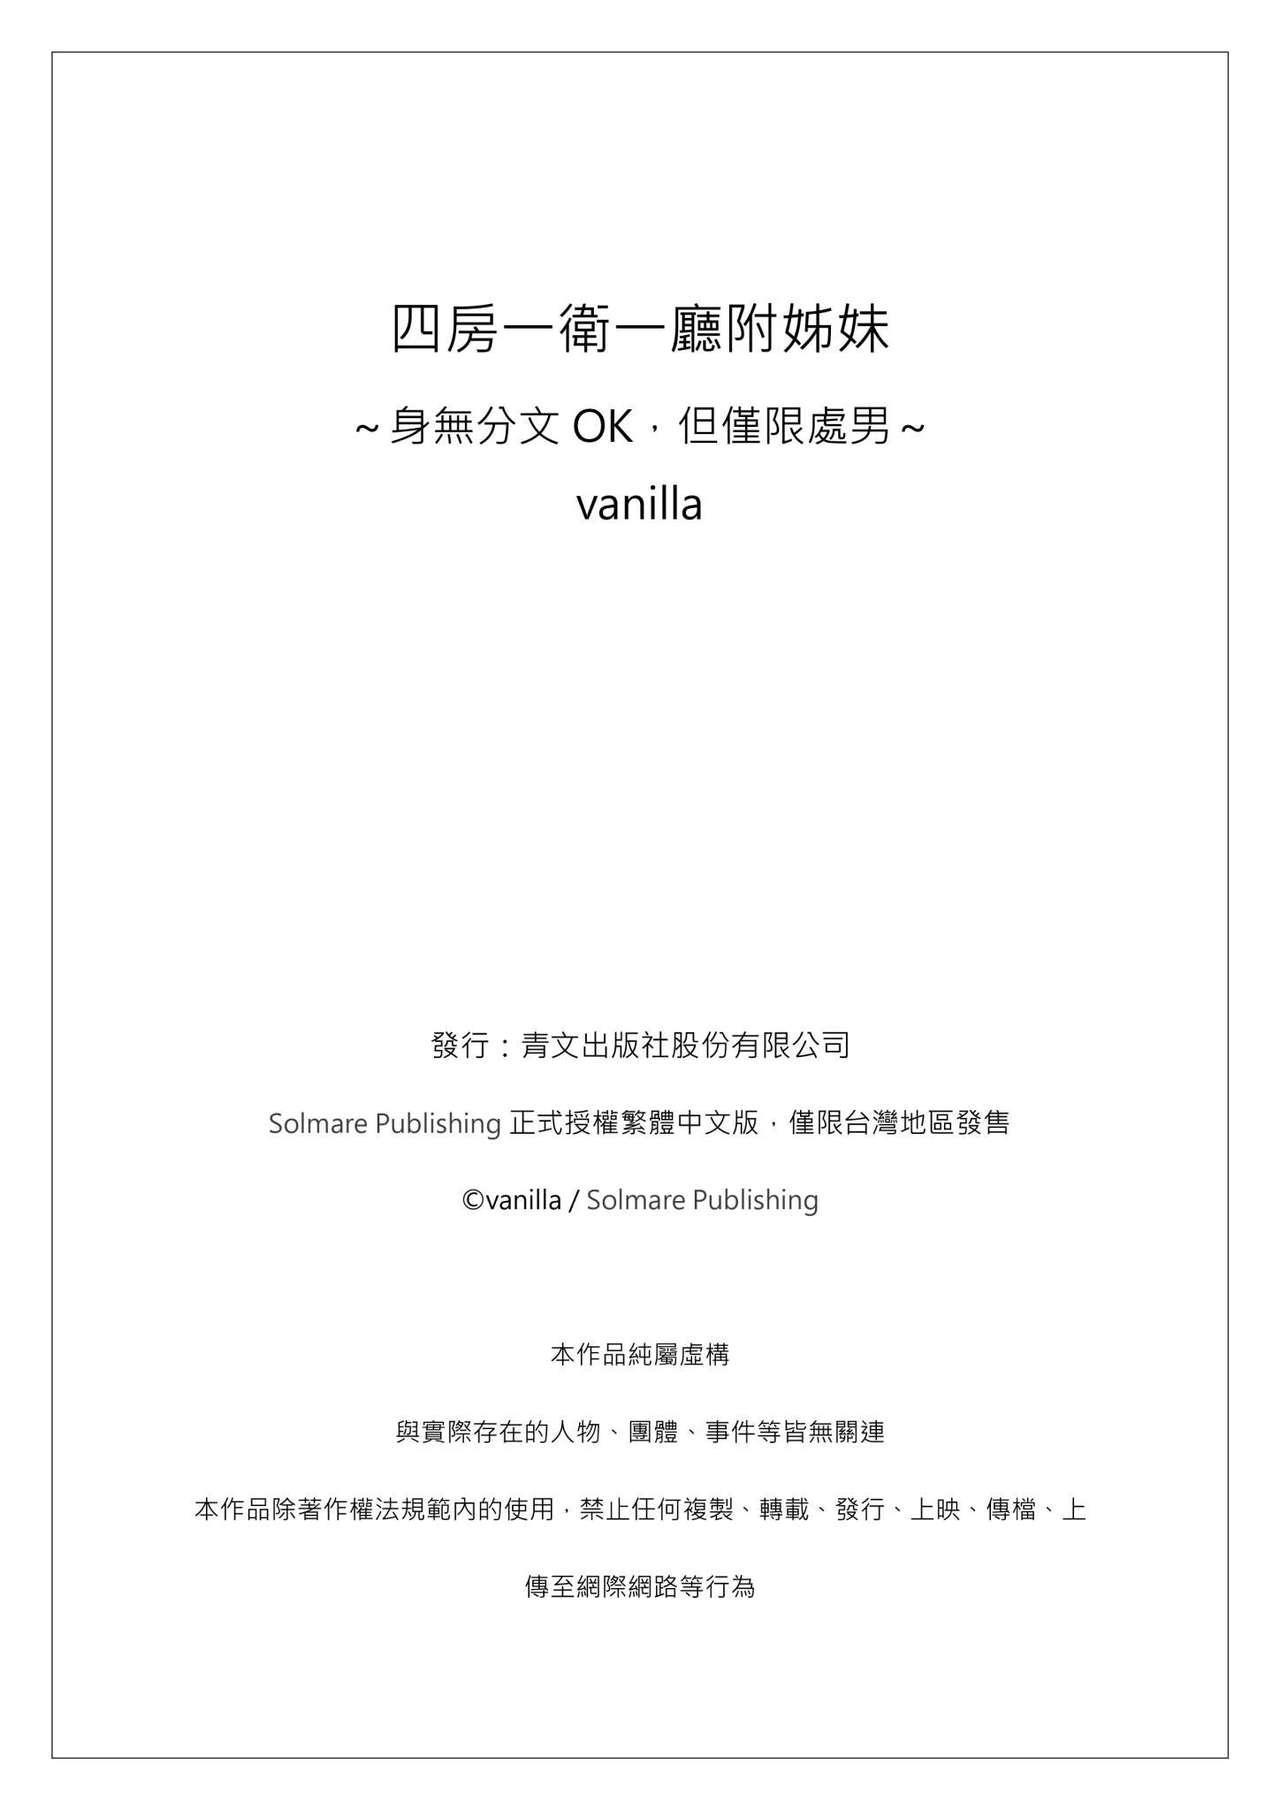 [vanilla] 4LDK Shimai Tsuki ~Muichimon OK, Tadashi Doutei ni Kagiru | 四房一衛一廳附姊妹 ~身無分文OK,但僅限處男~ Ch. 2 [Chinese] 26